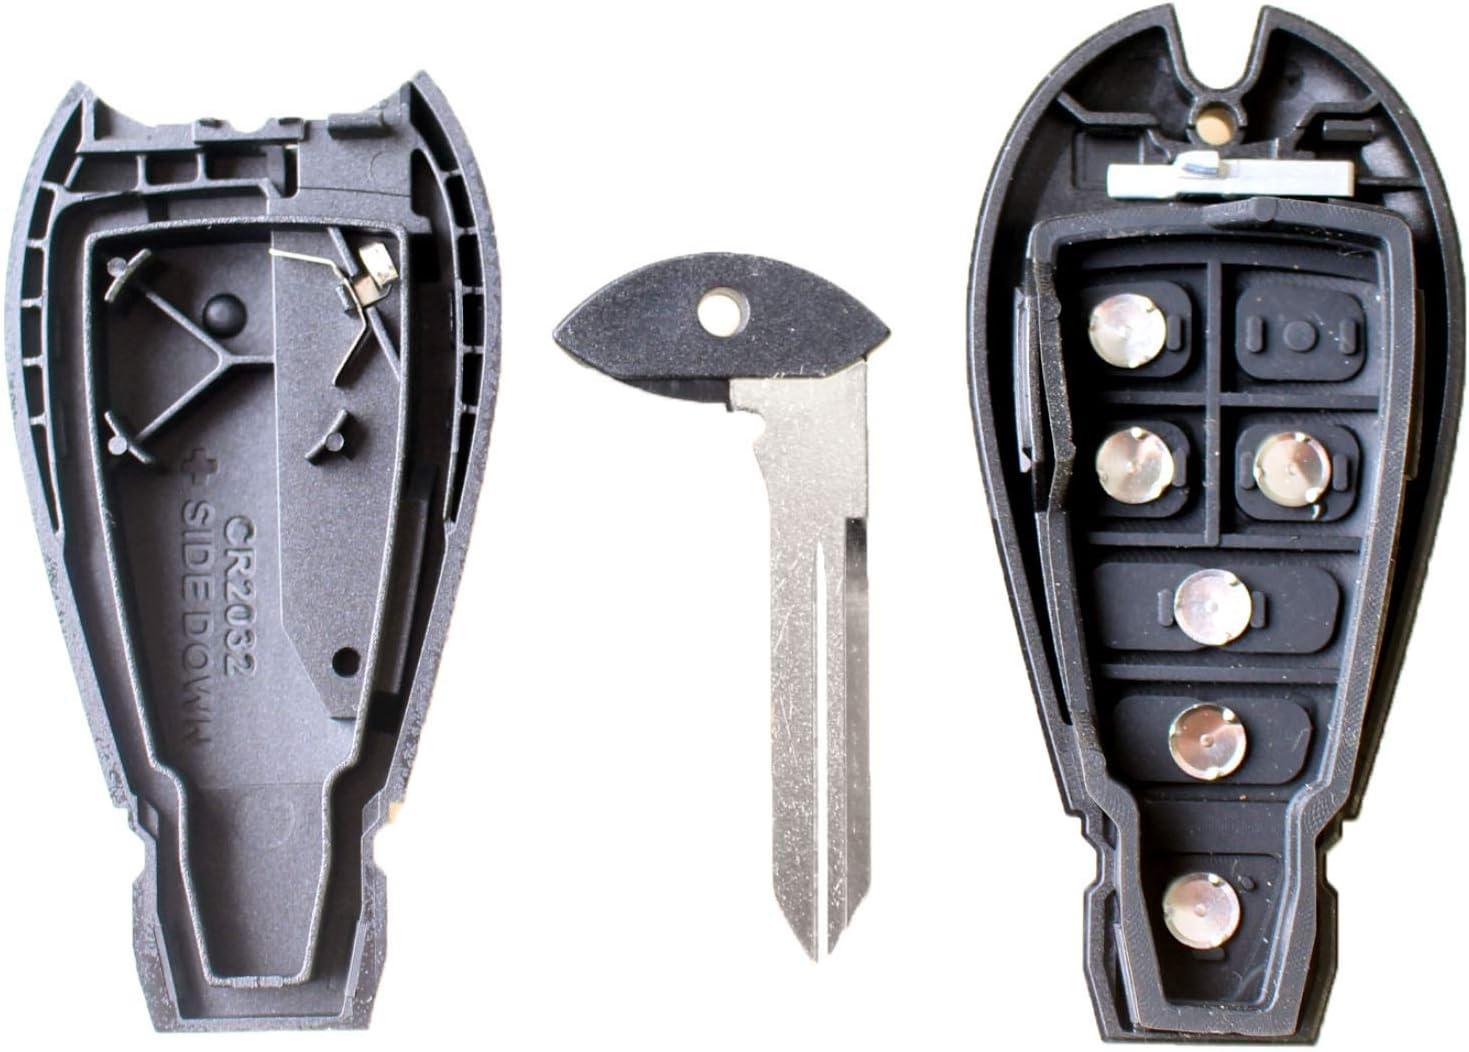 5 Blank 1panic 6 Buttons Remote Control Key Shell For Elektronik